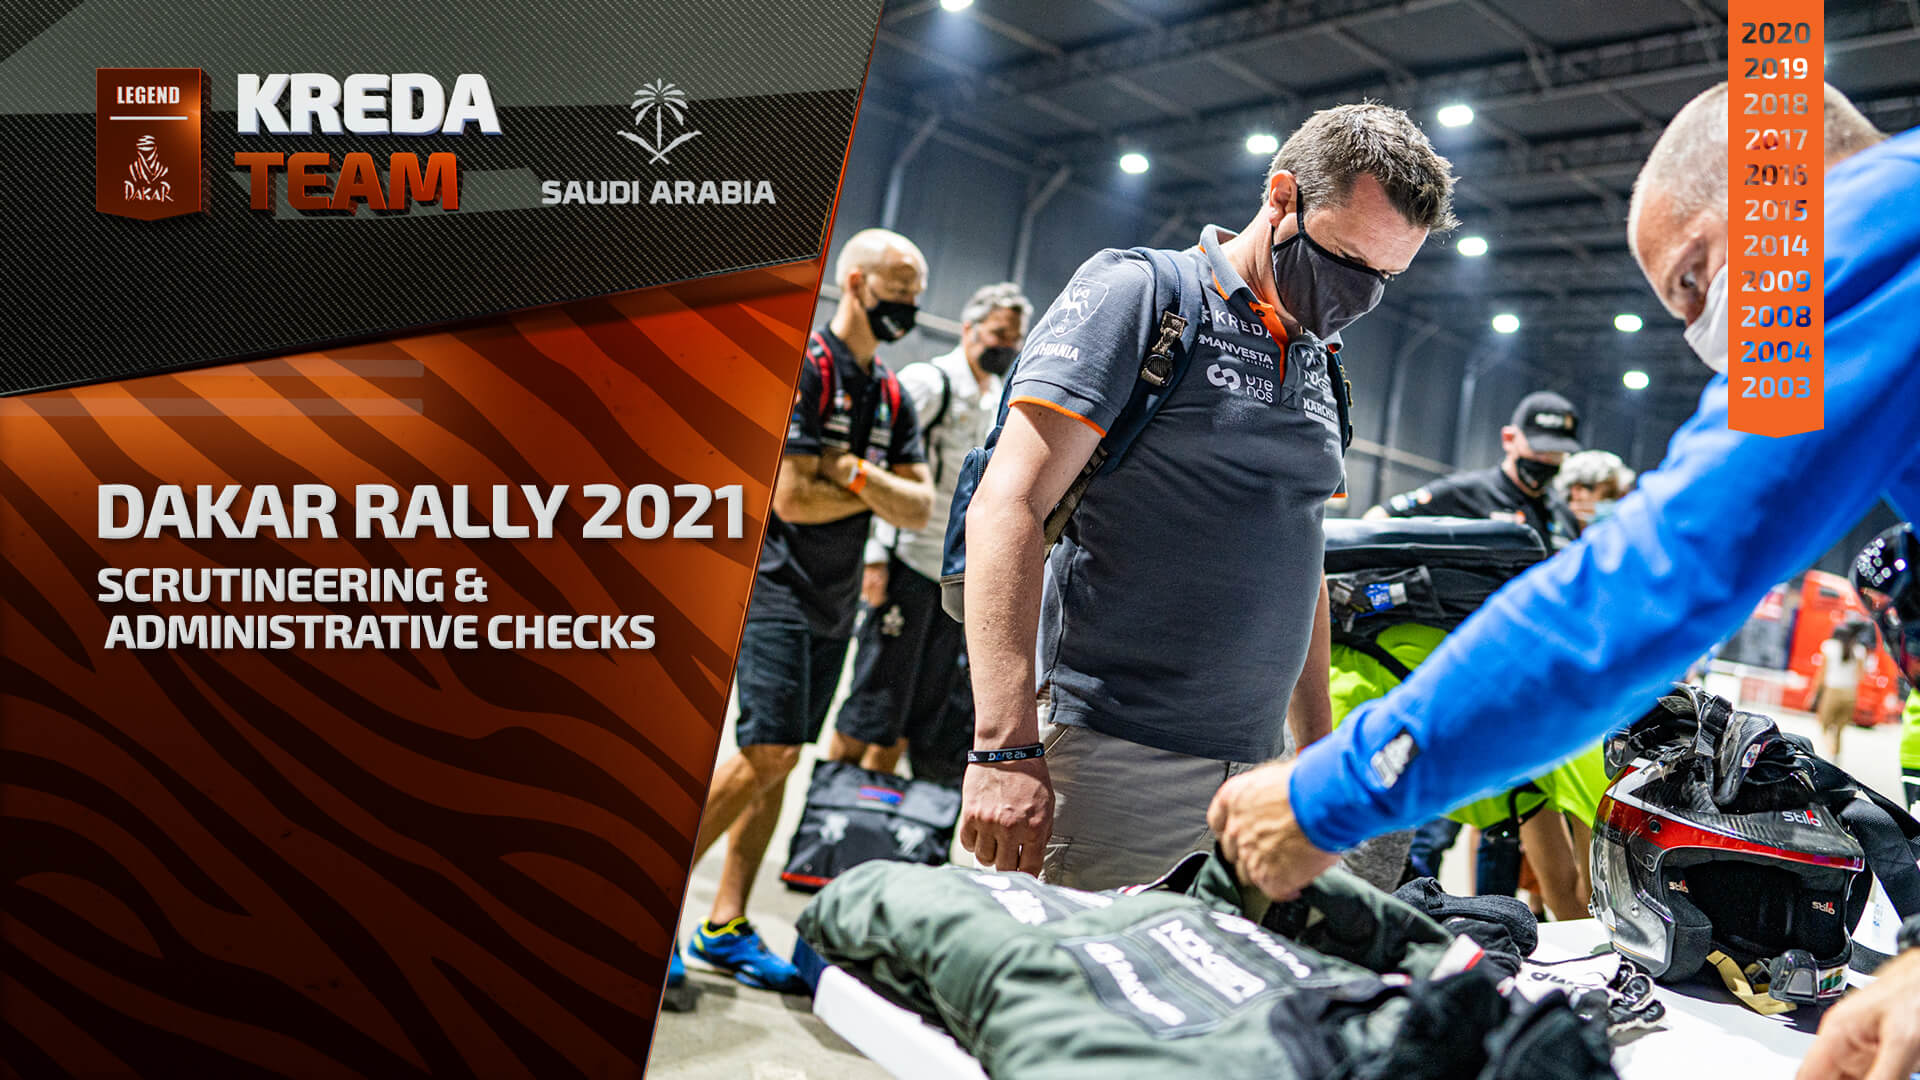 Dakar rally 2021. Scrutineering & Administrative Checks